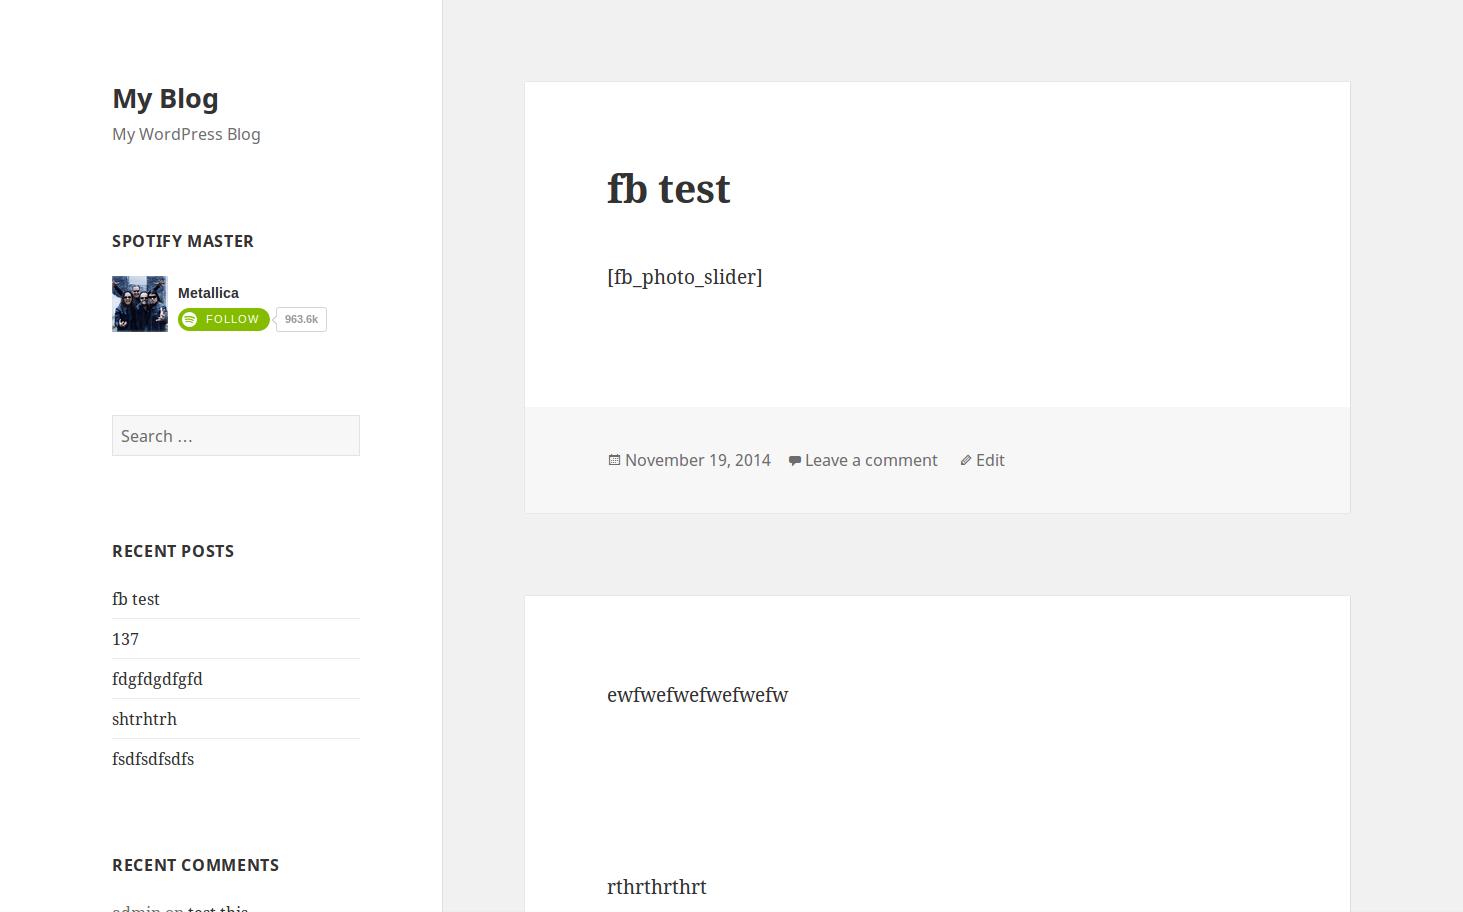 wordpress plugins spotify master 12